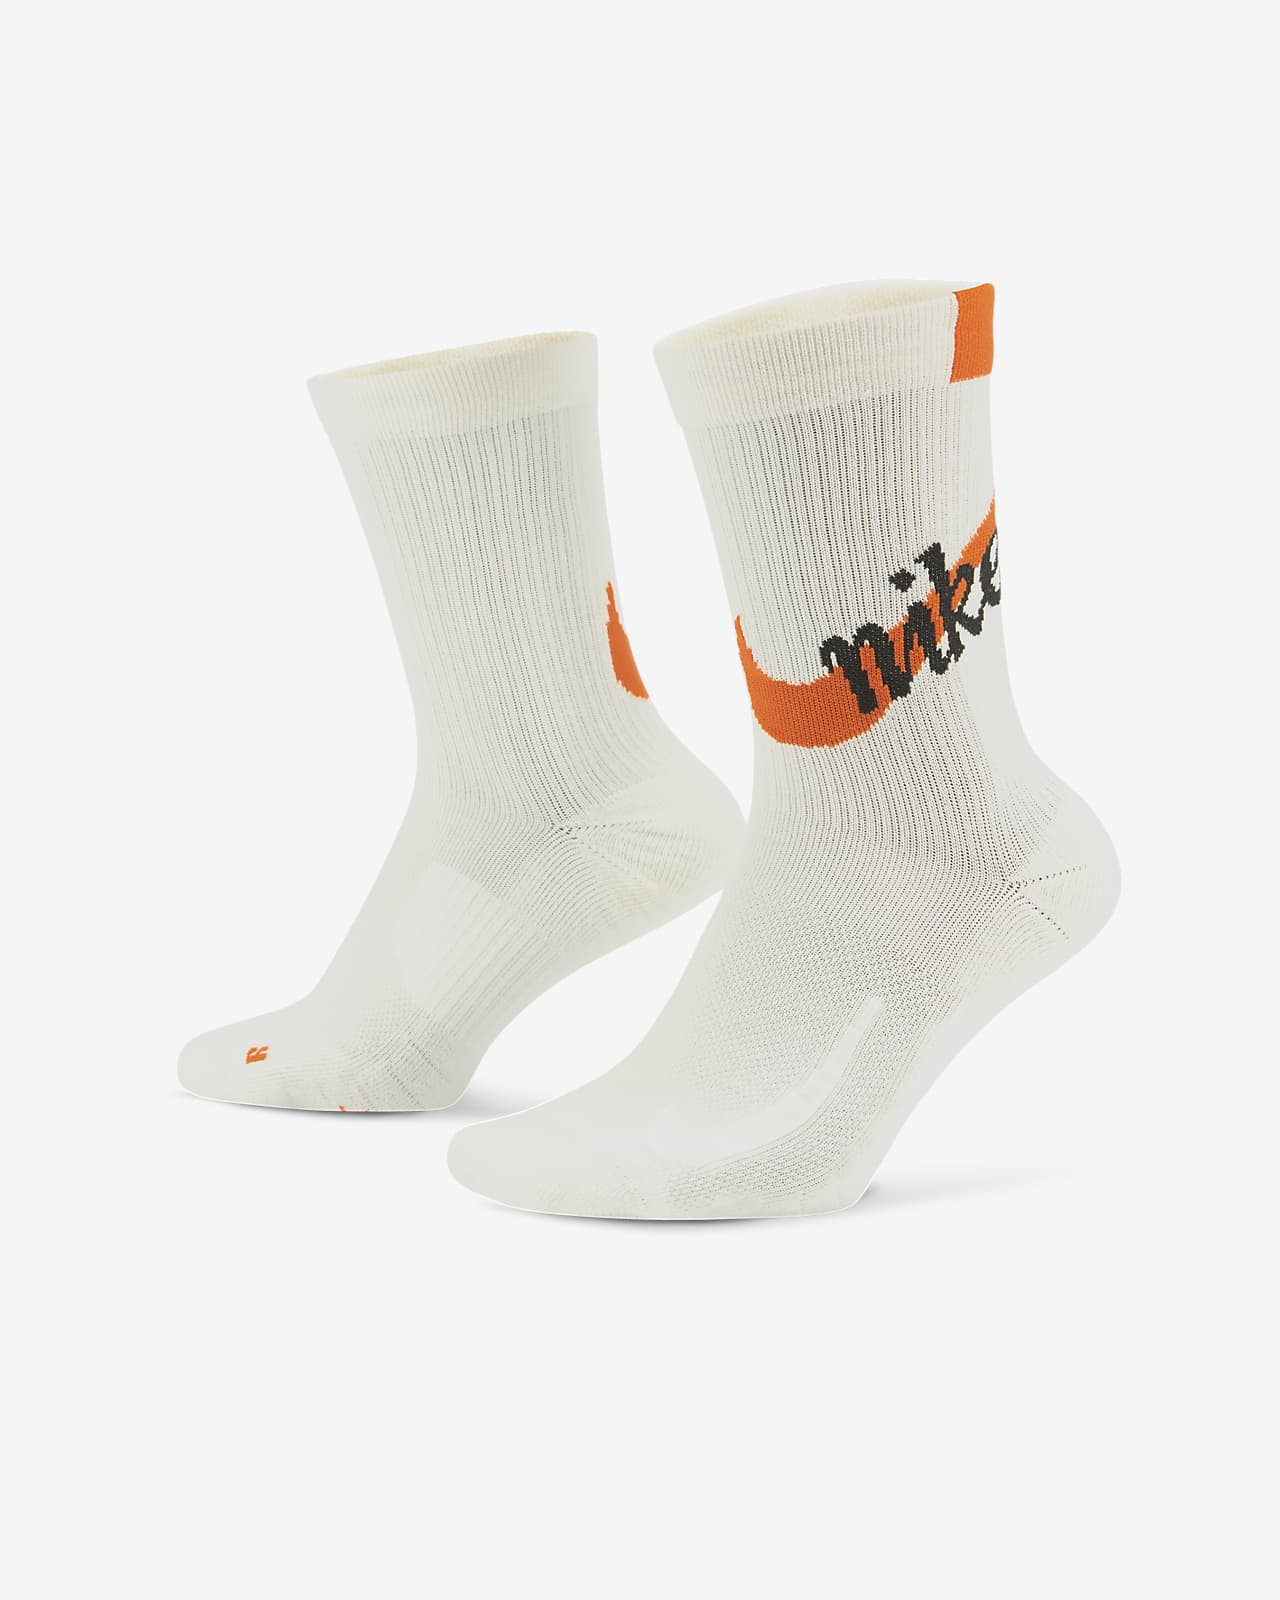 Calcetines largos de running Nike Multiplier